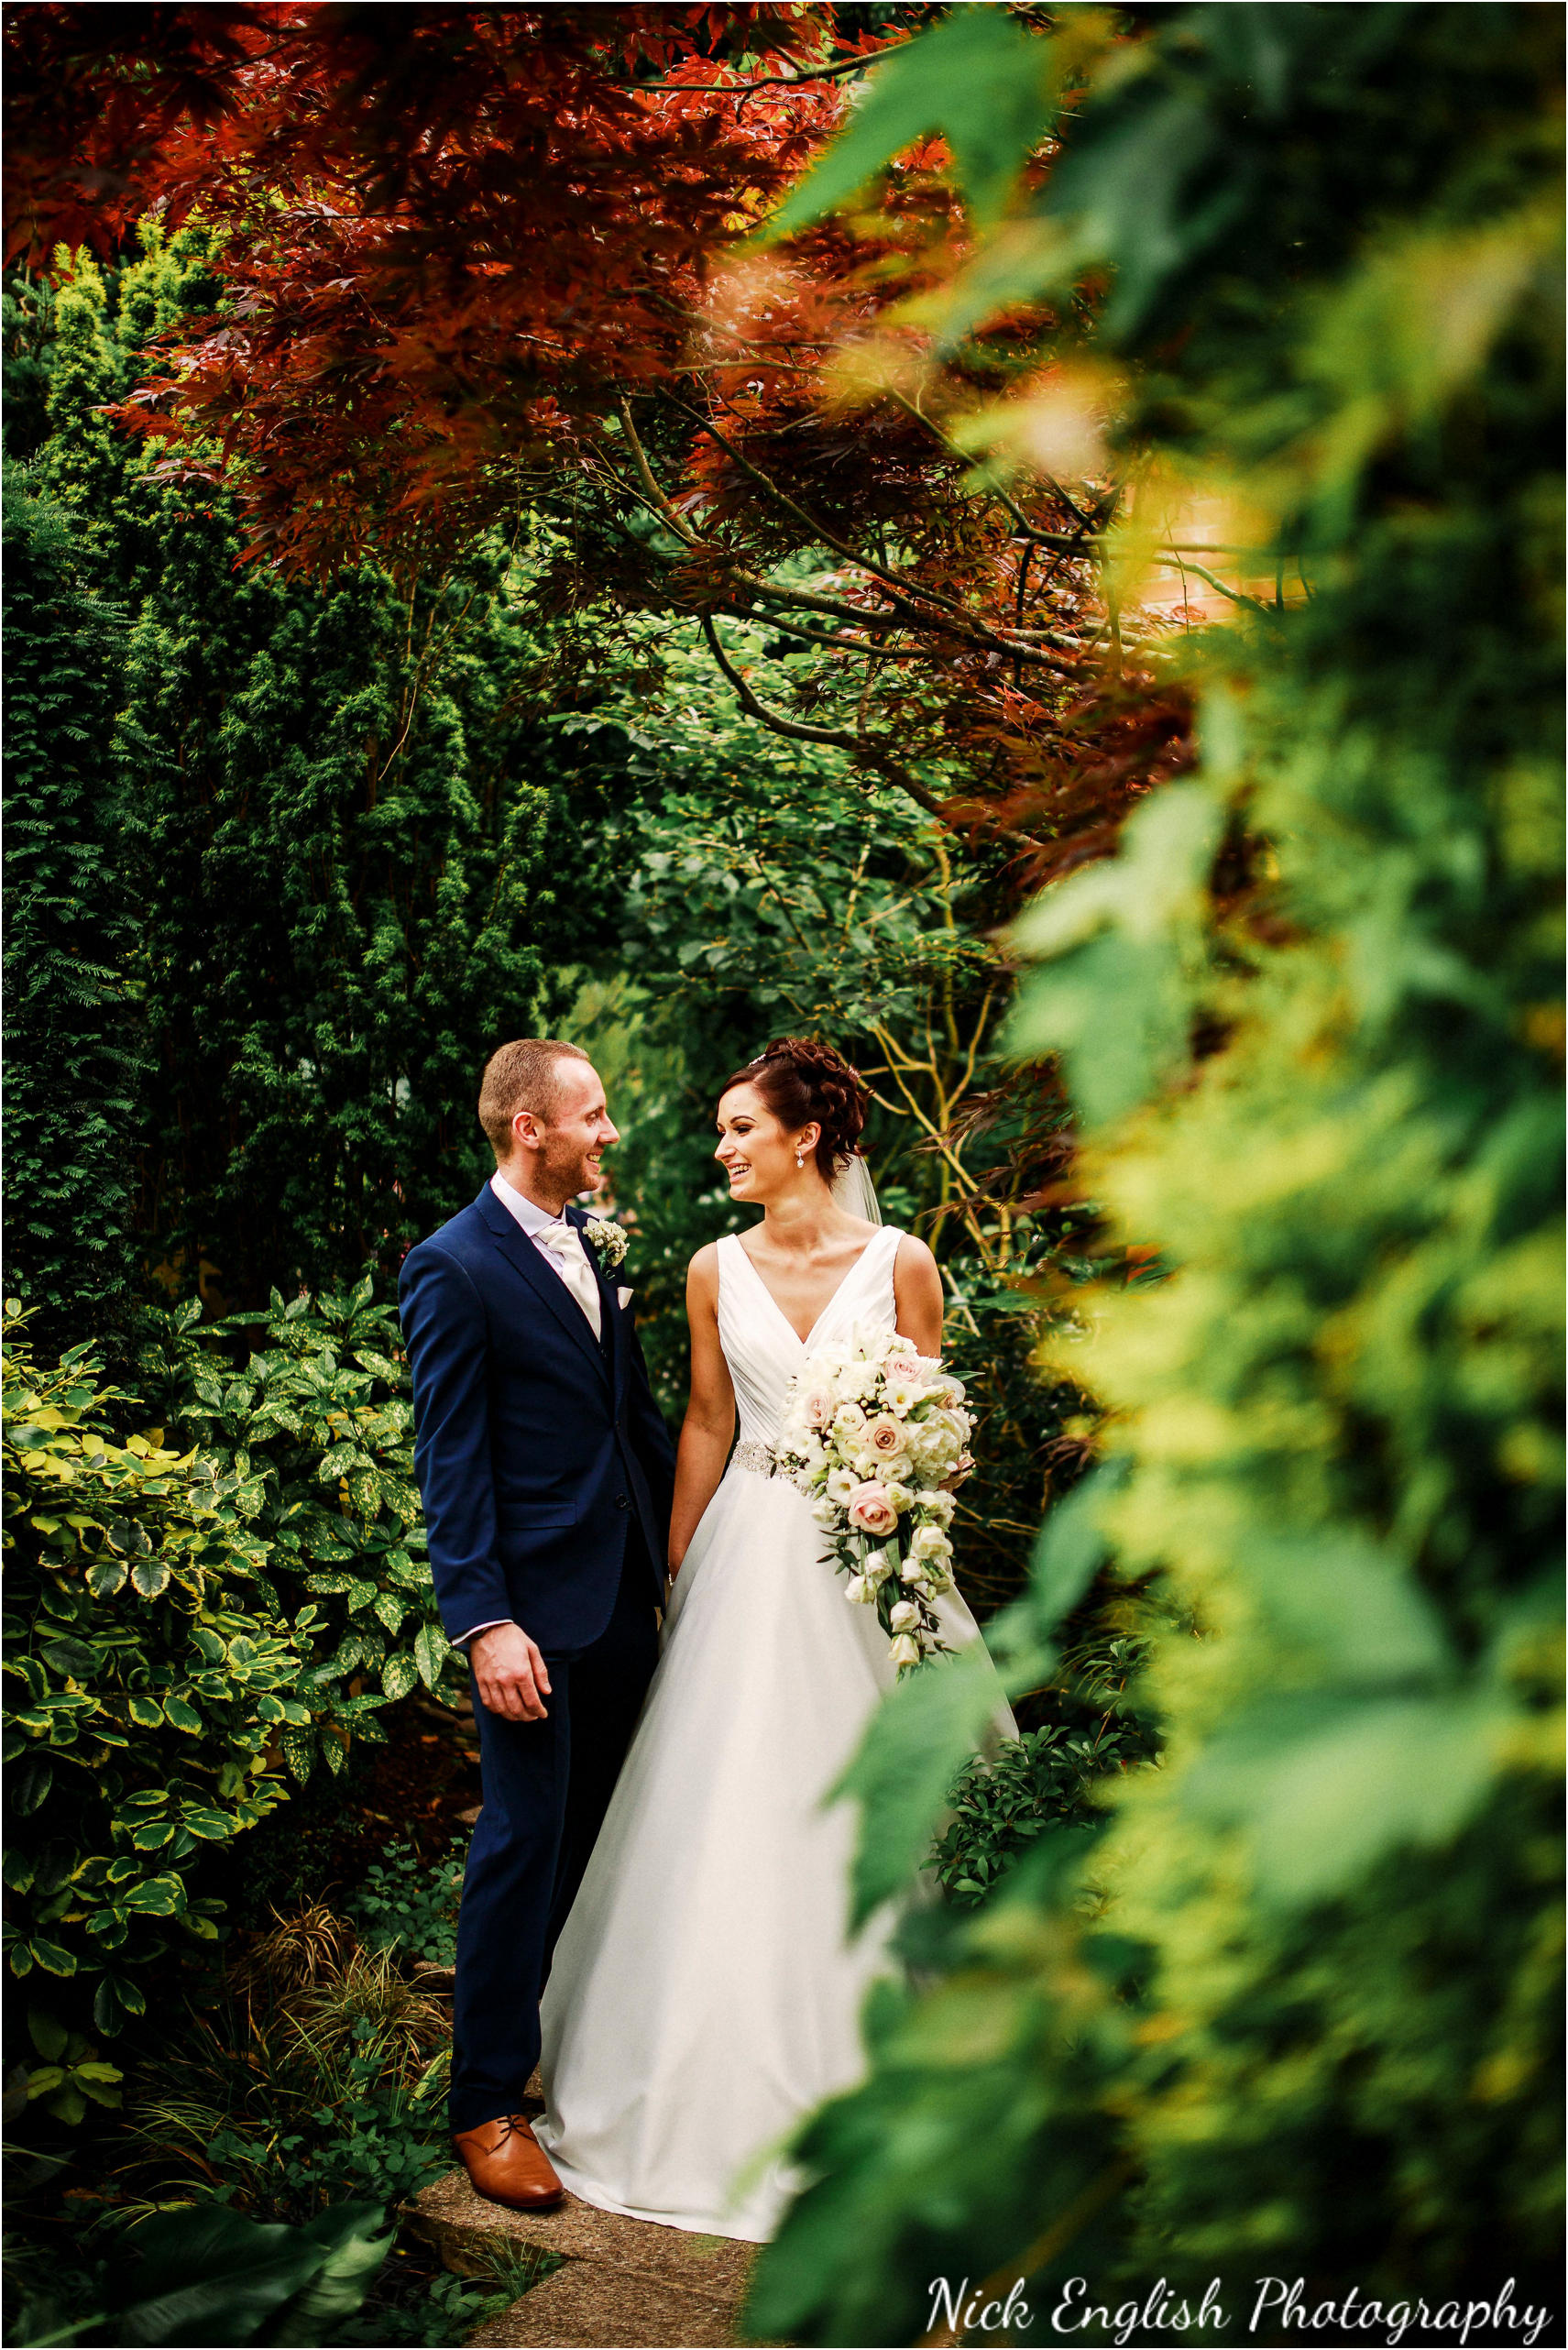 Emily David Wedding Photographs at Barton Grange Preston by Nick English Photography 142jpg.jpeg